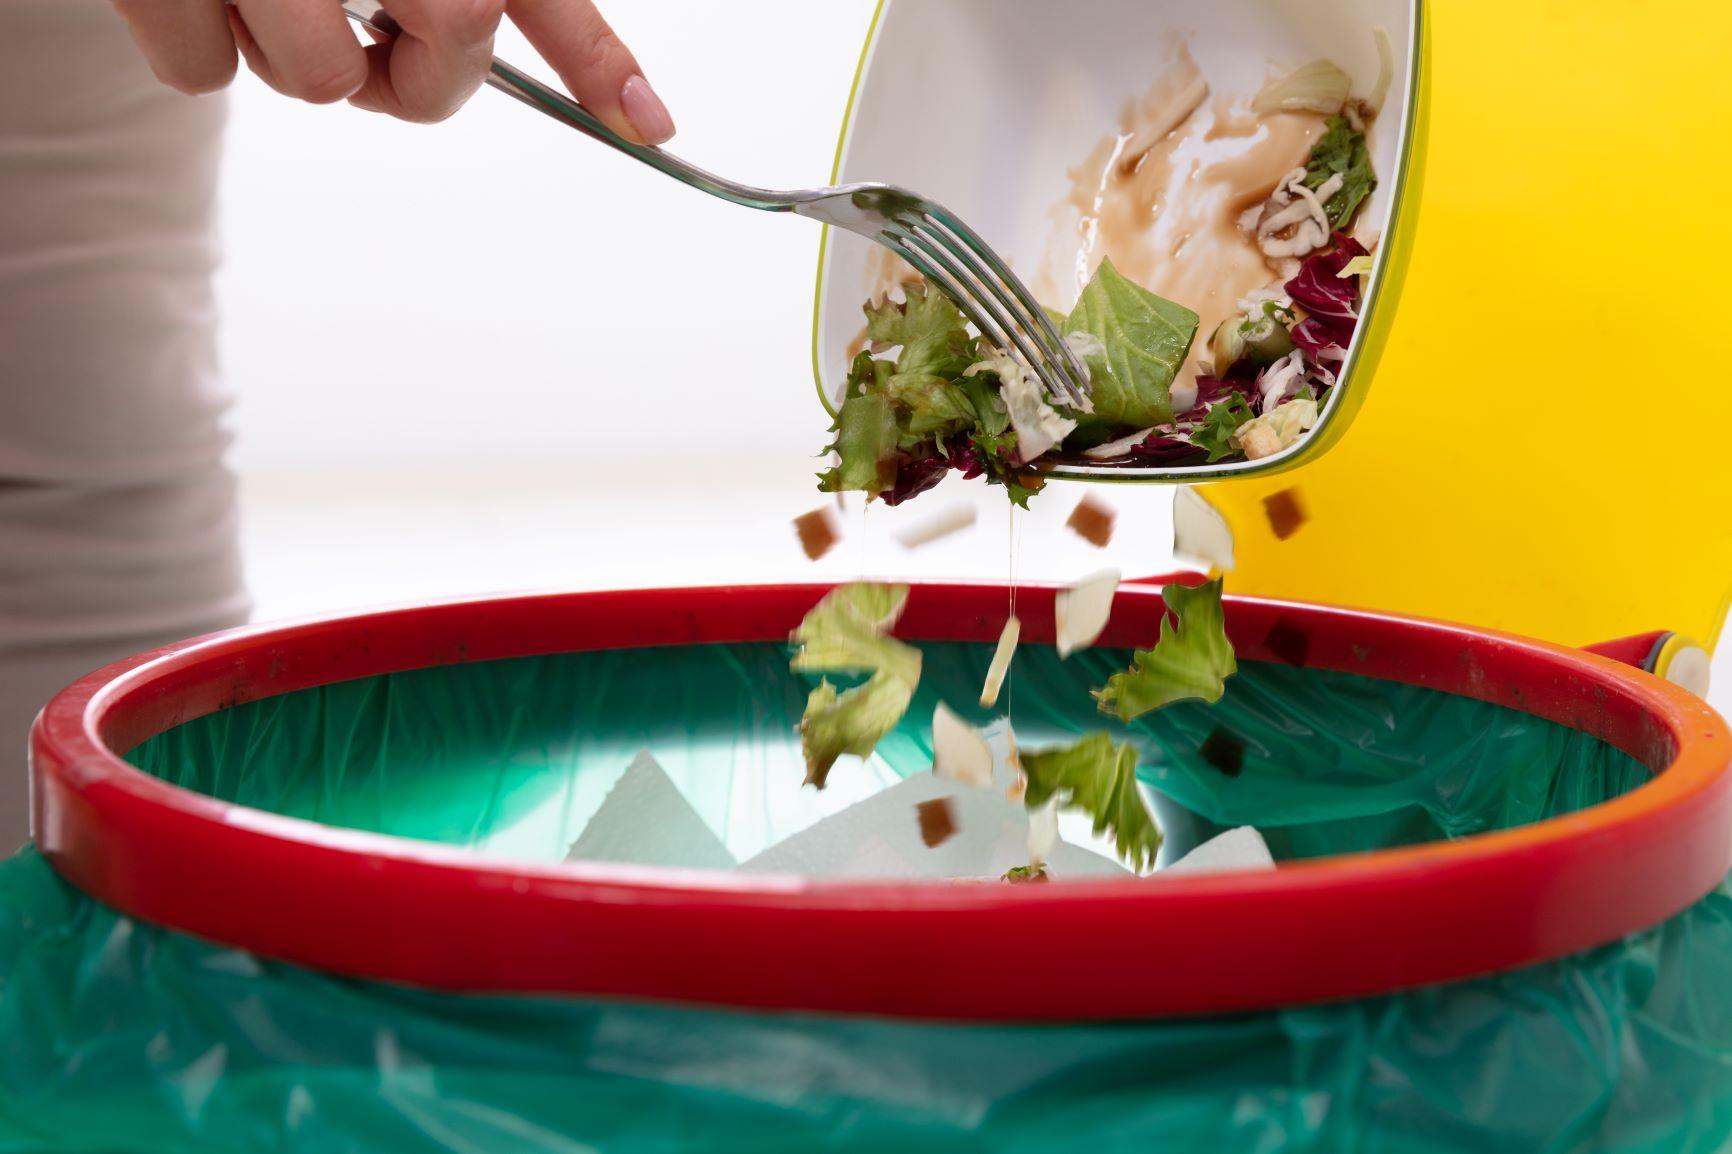 TDRI ห่วงอาหารเหลือเป็นขยะอื้อ แนะบริโภคแต่พอดี แปรรูปใช้ภาคเกษตร thaihealth